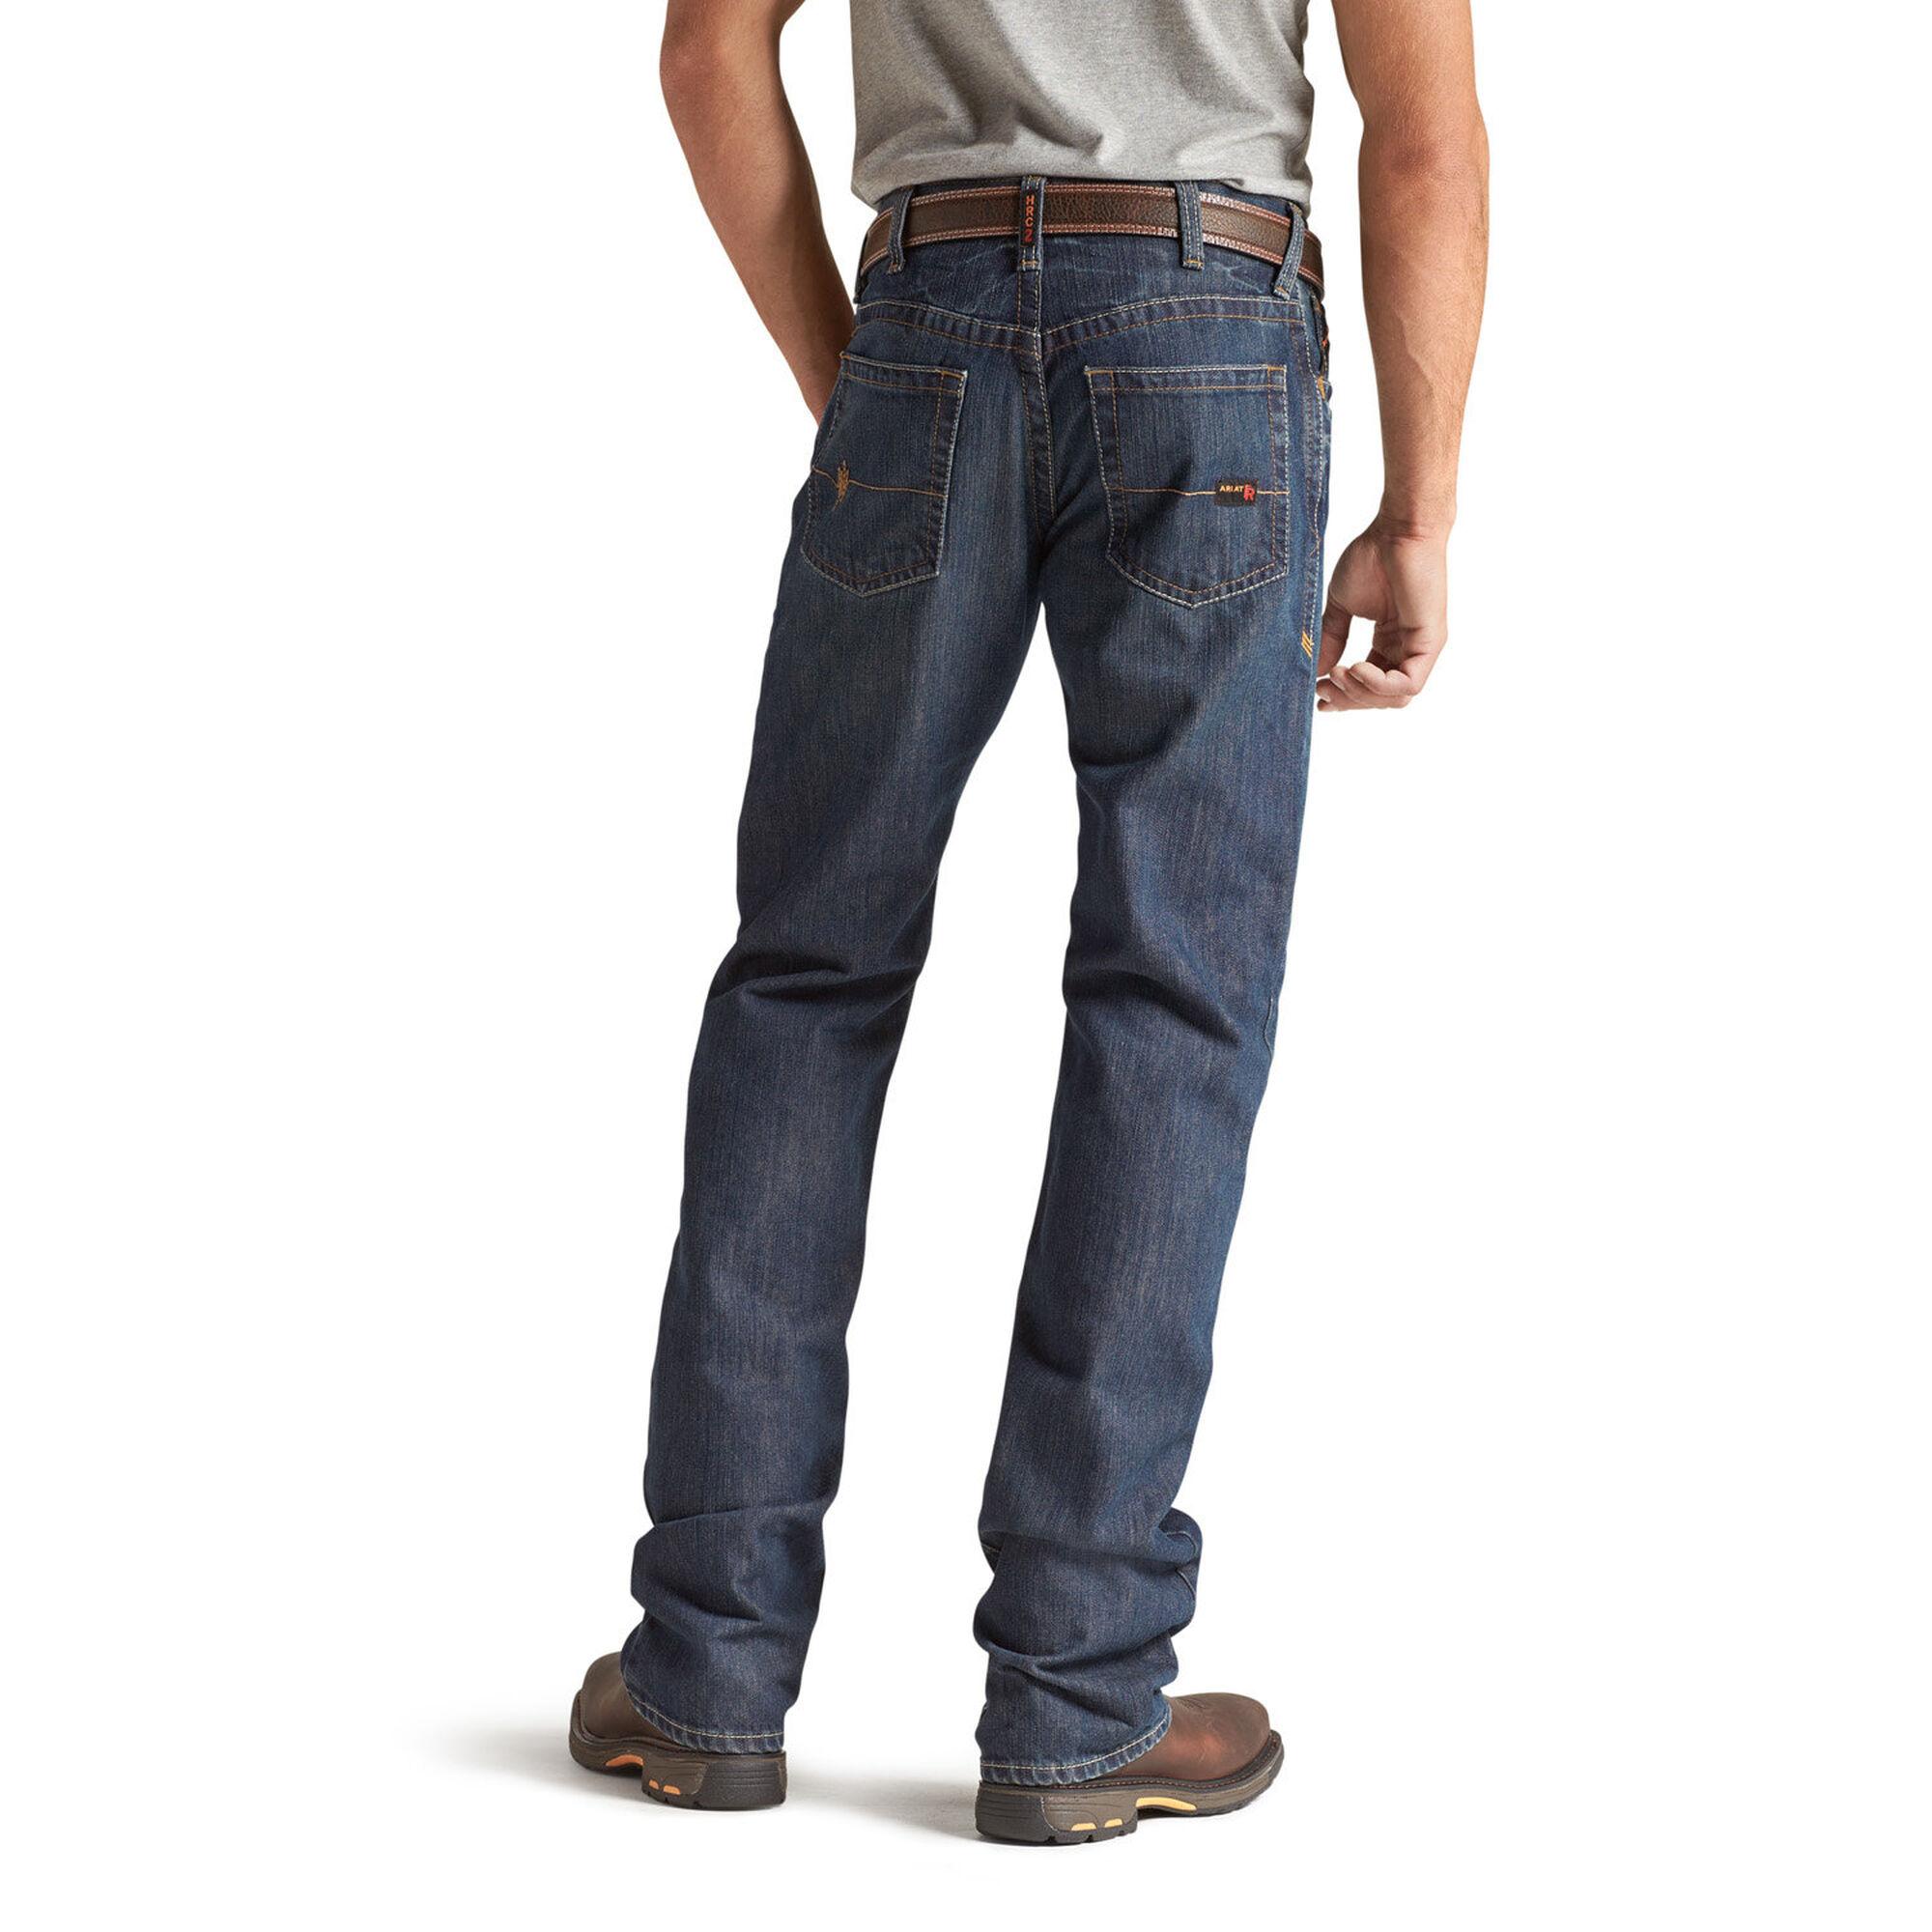 2a7a8dfeadb Images. FR M4 Low Rise Basic Boot Cut Jean